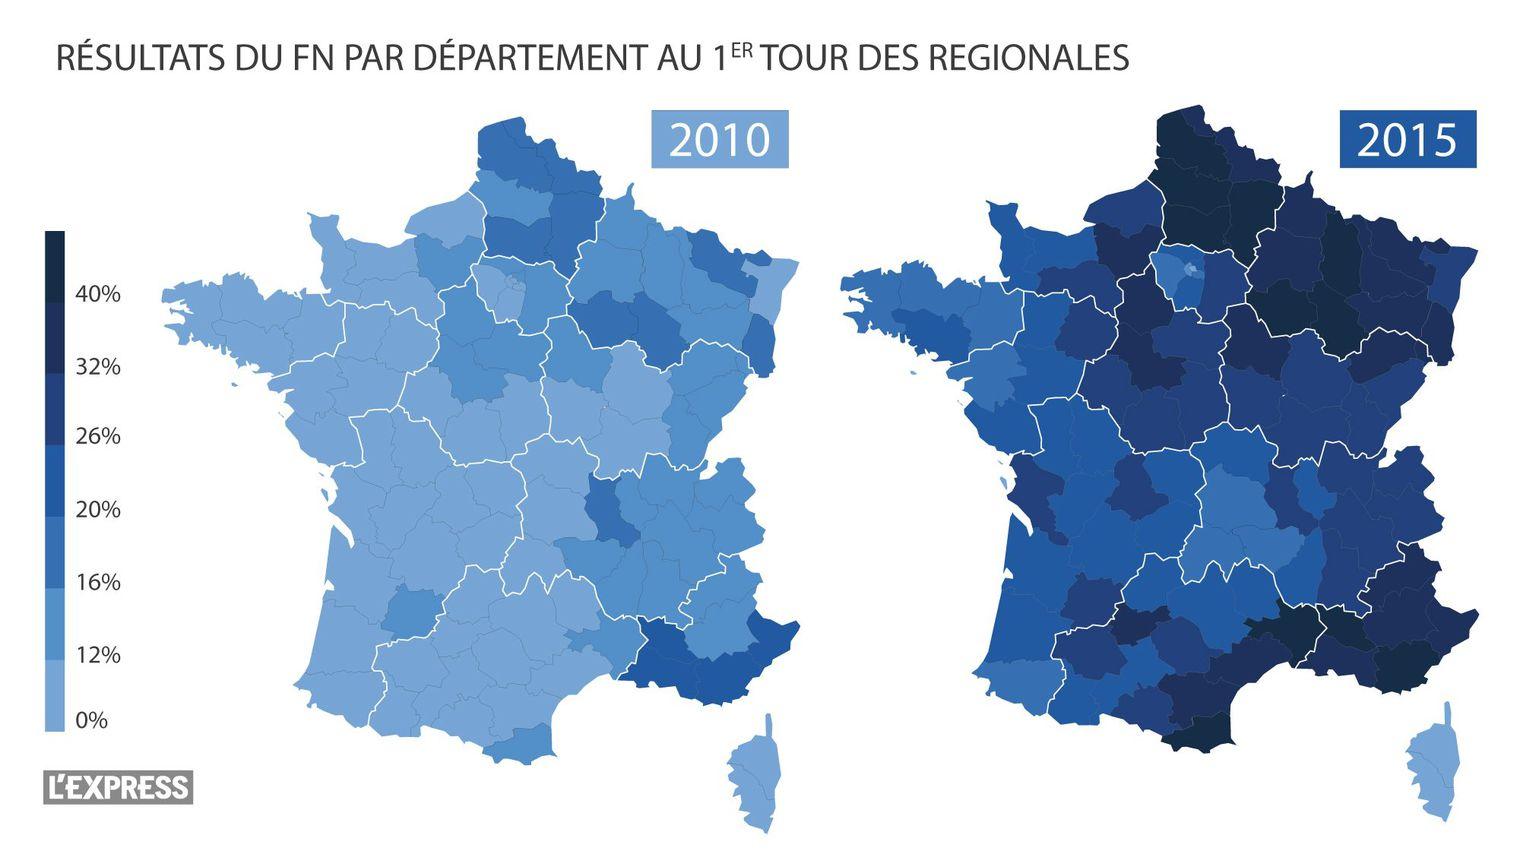 resultats-fn-regionales-par-departement-2010-2015_5478394